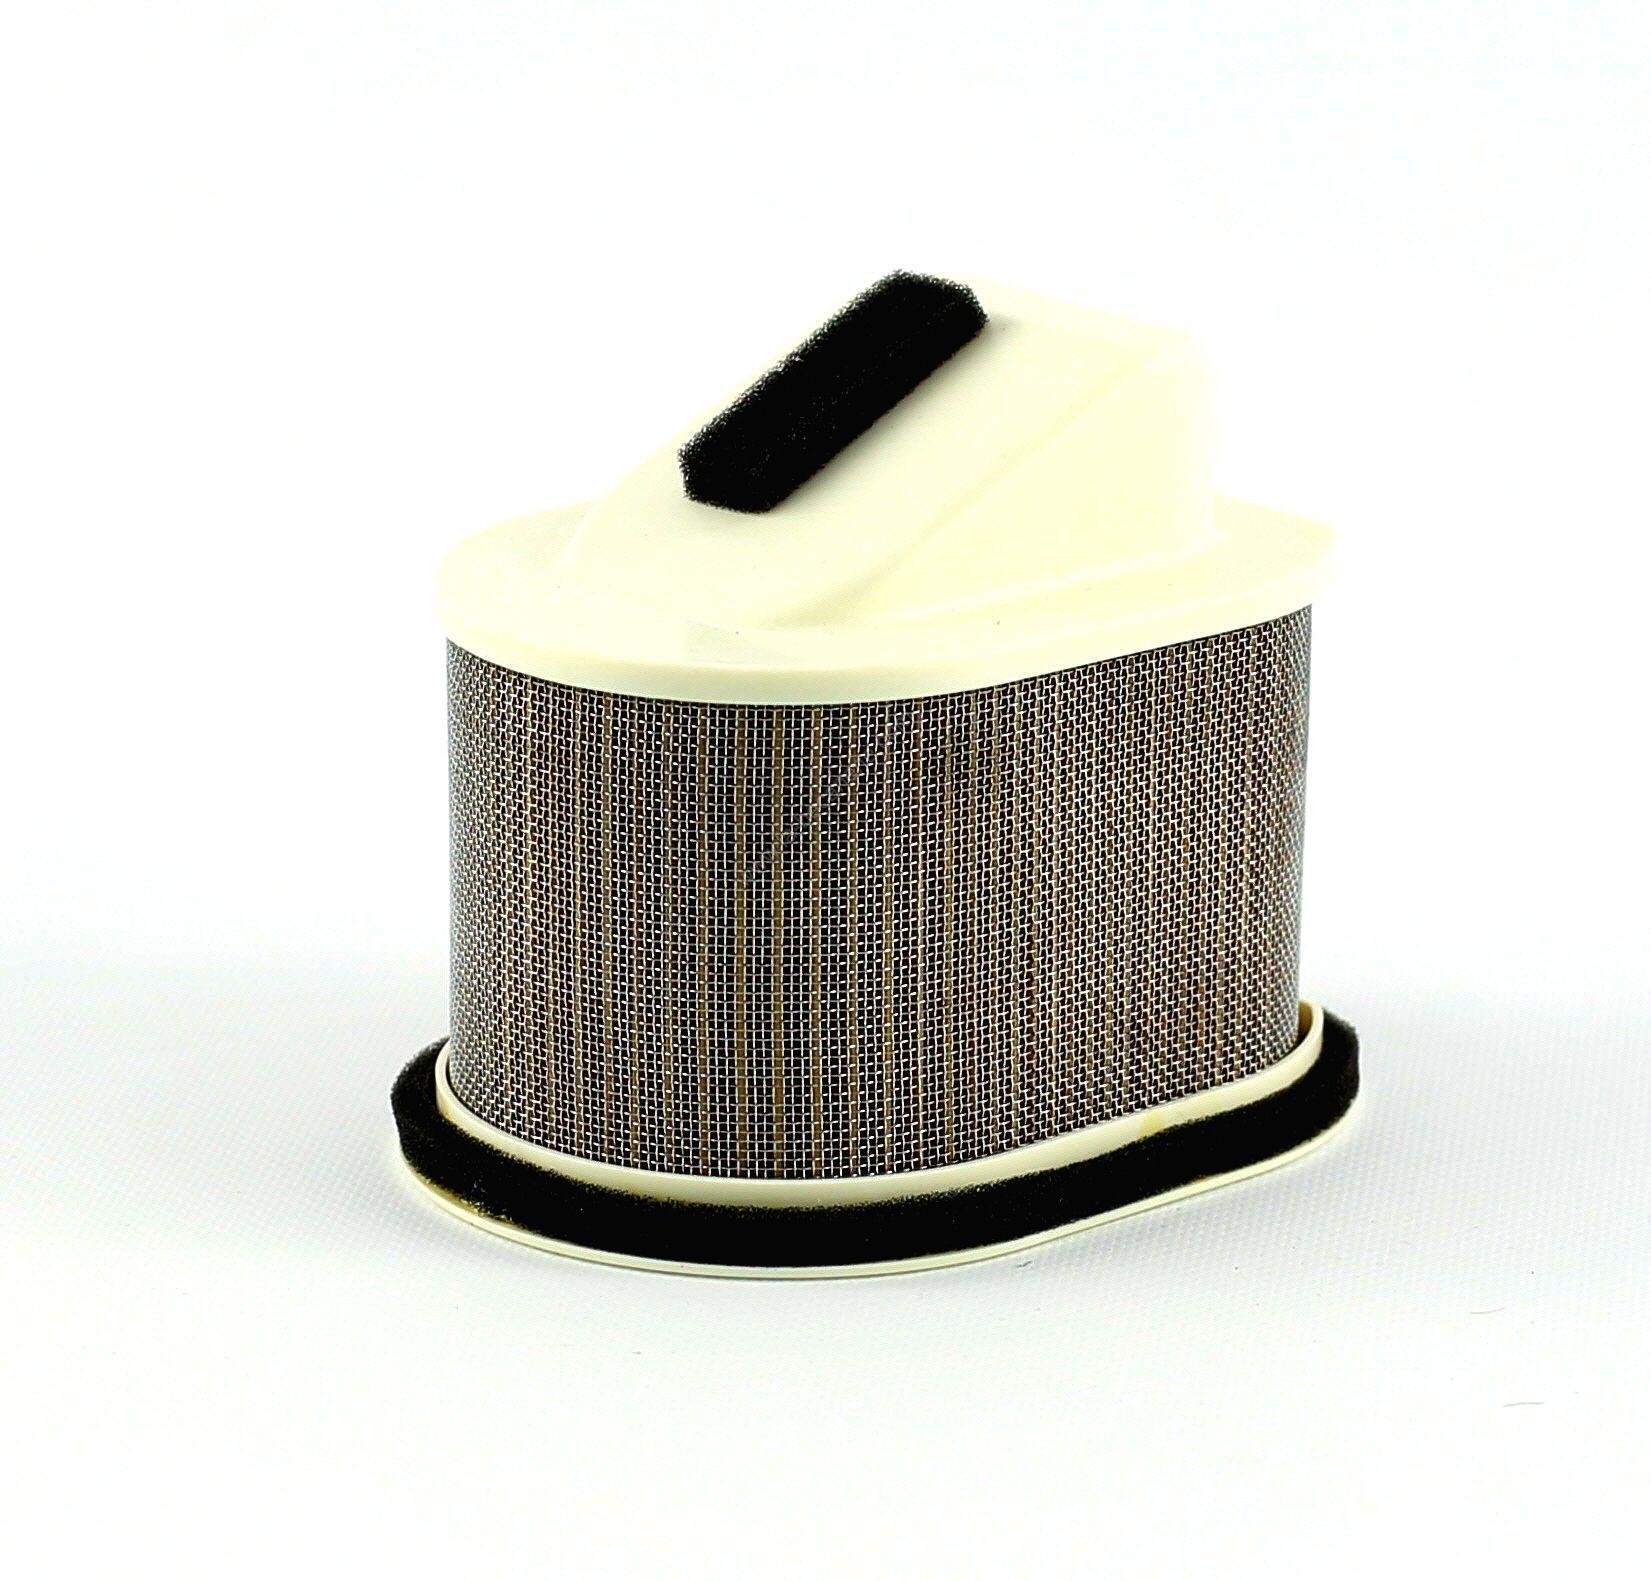 filtre air bihr kawasaki nd k40 pi ces carburation sur la b canerie. Black Bedroom Furniture Sets. Home Design Ideas